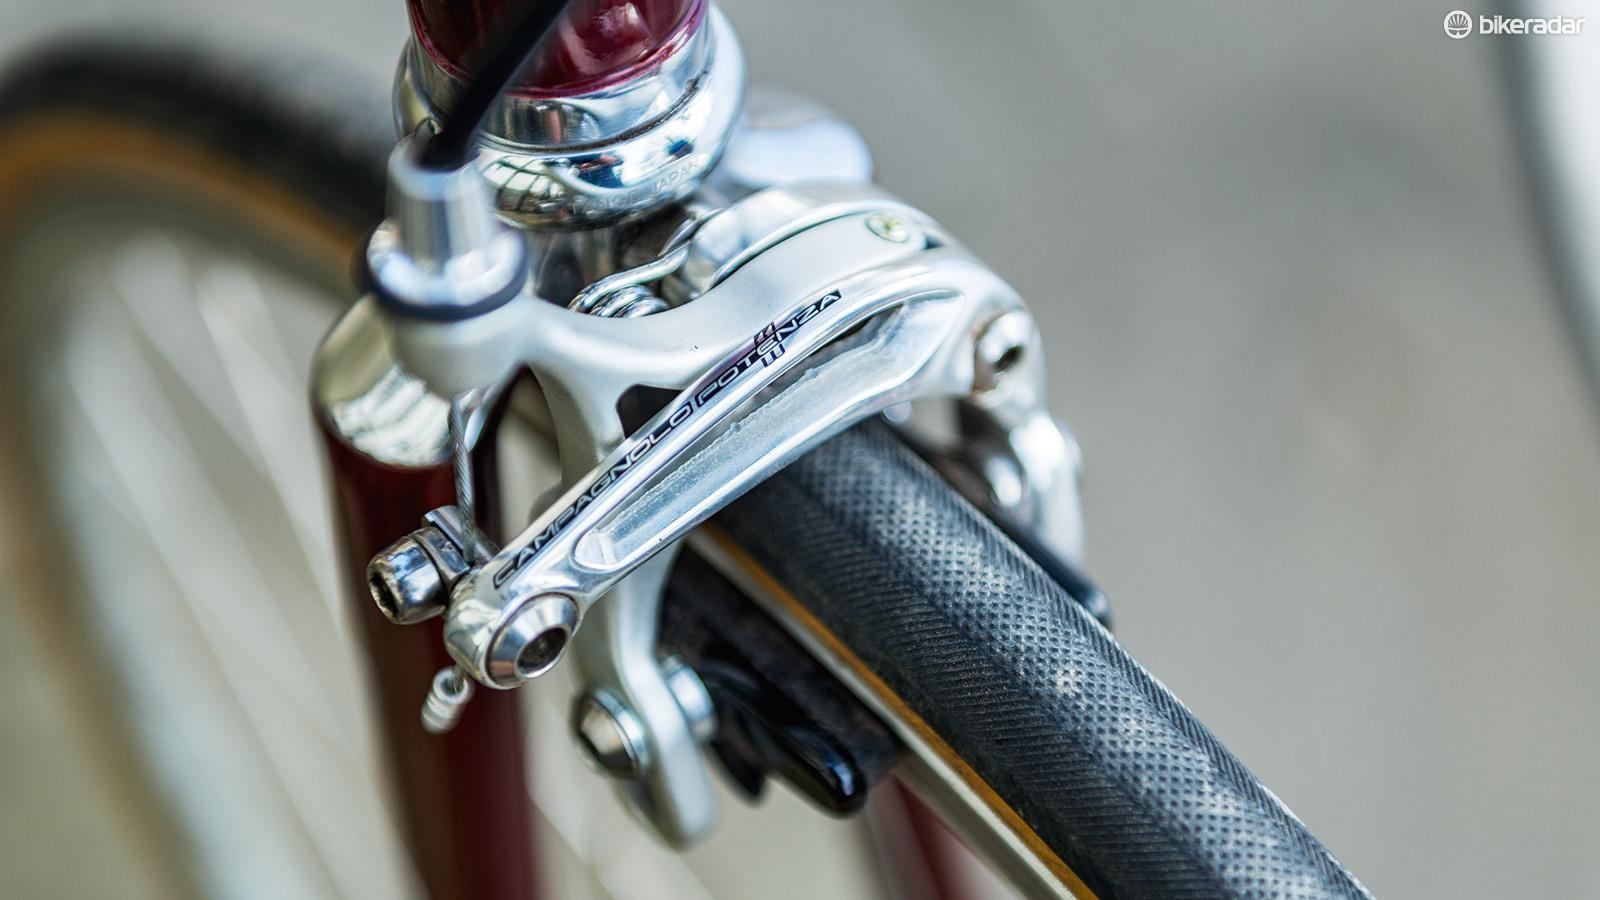 Campagnolo Potenzais on braking duties